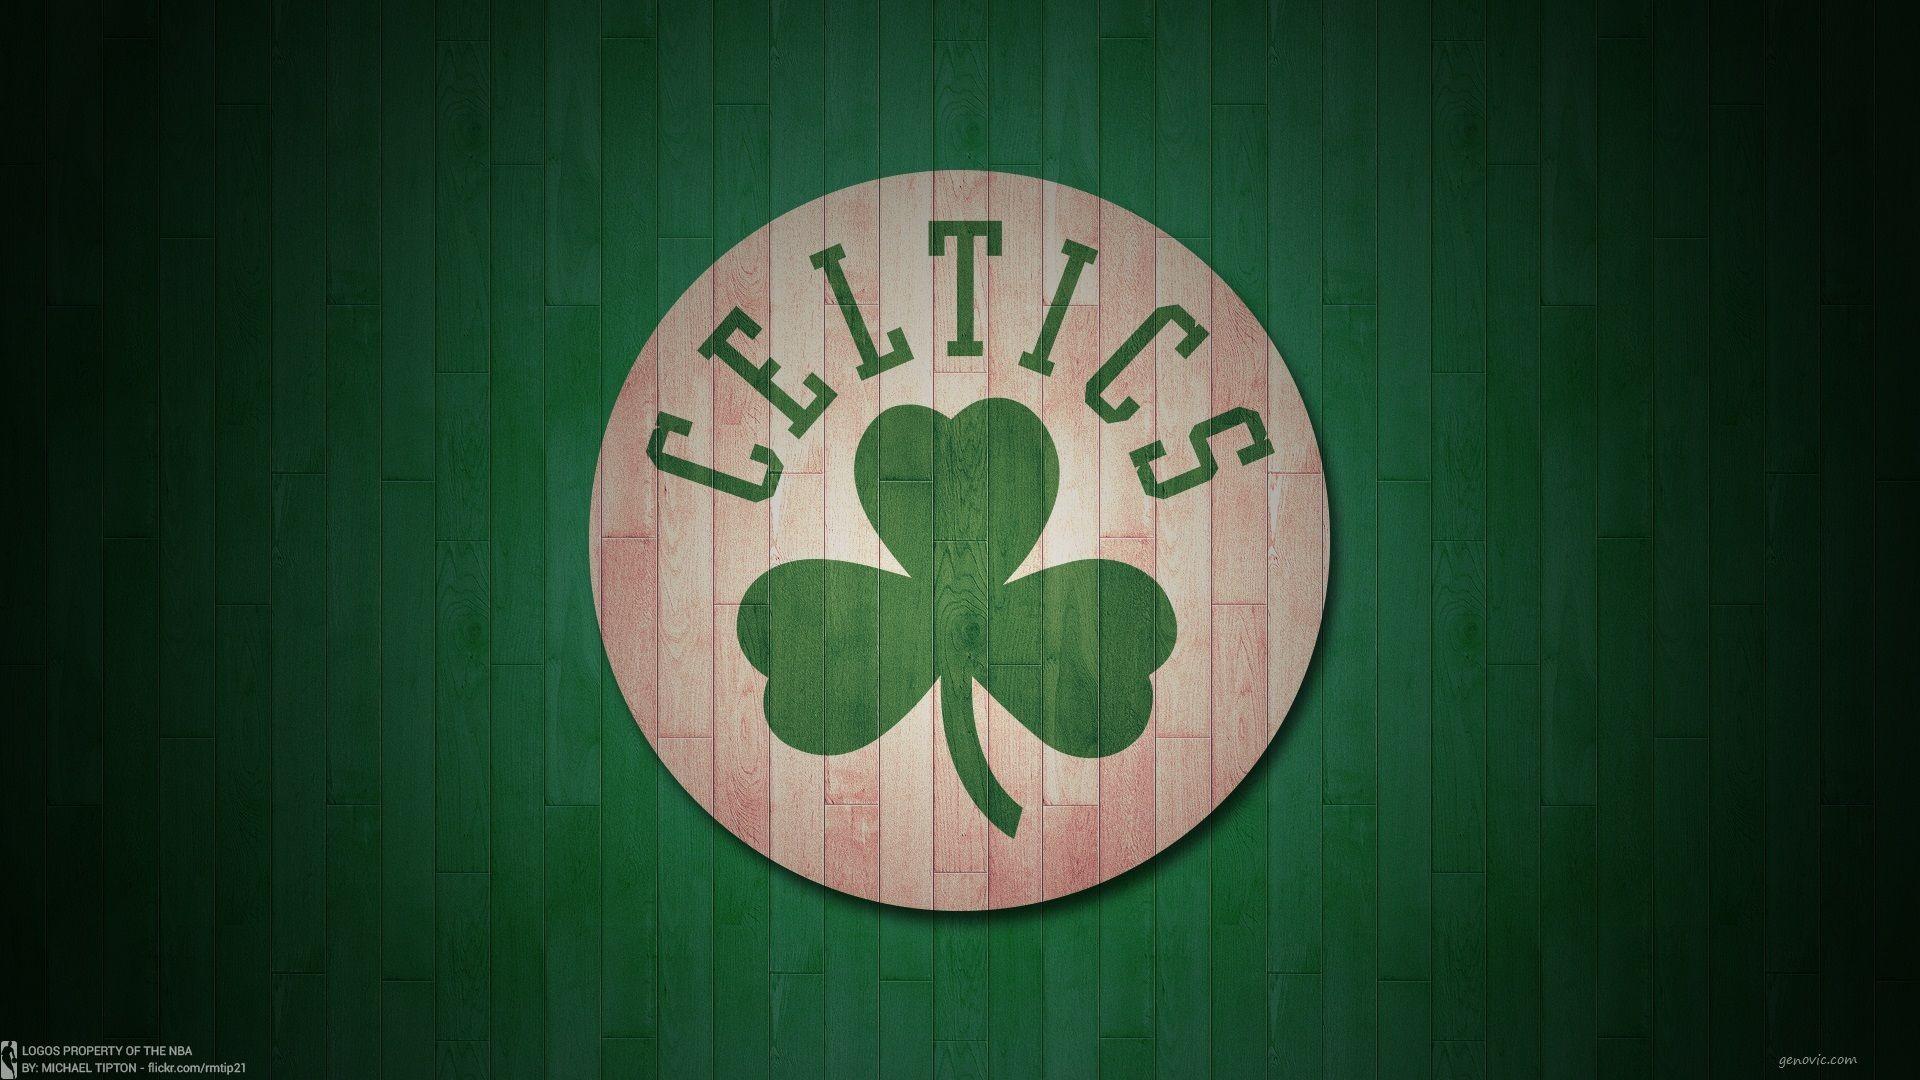 Boston Celtics Wallpapers 86 Images